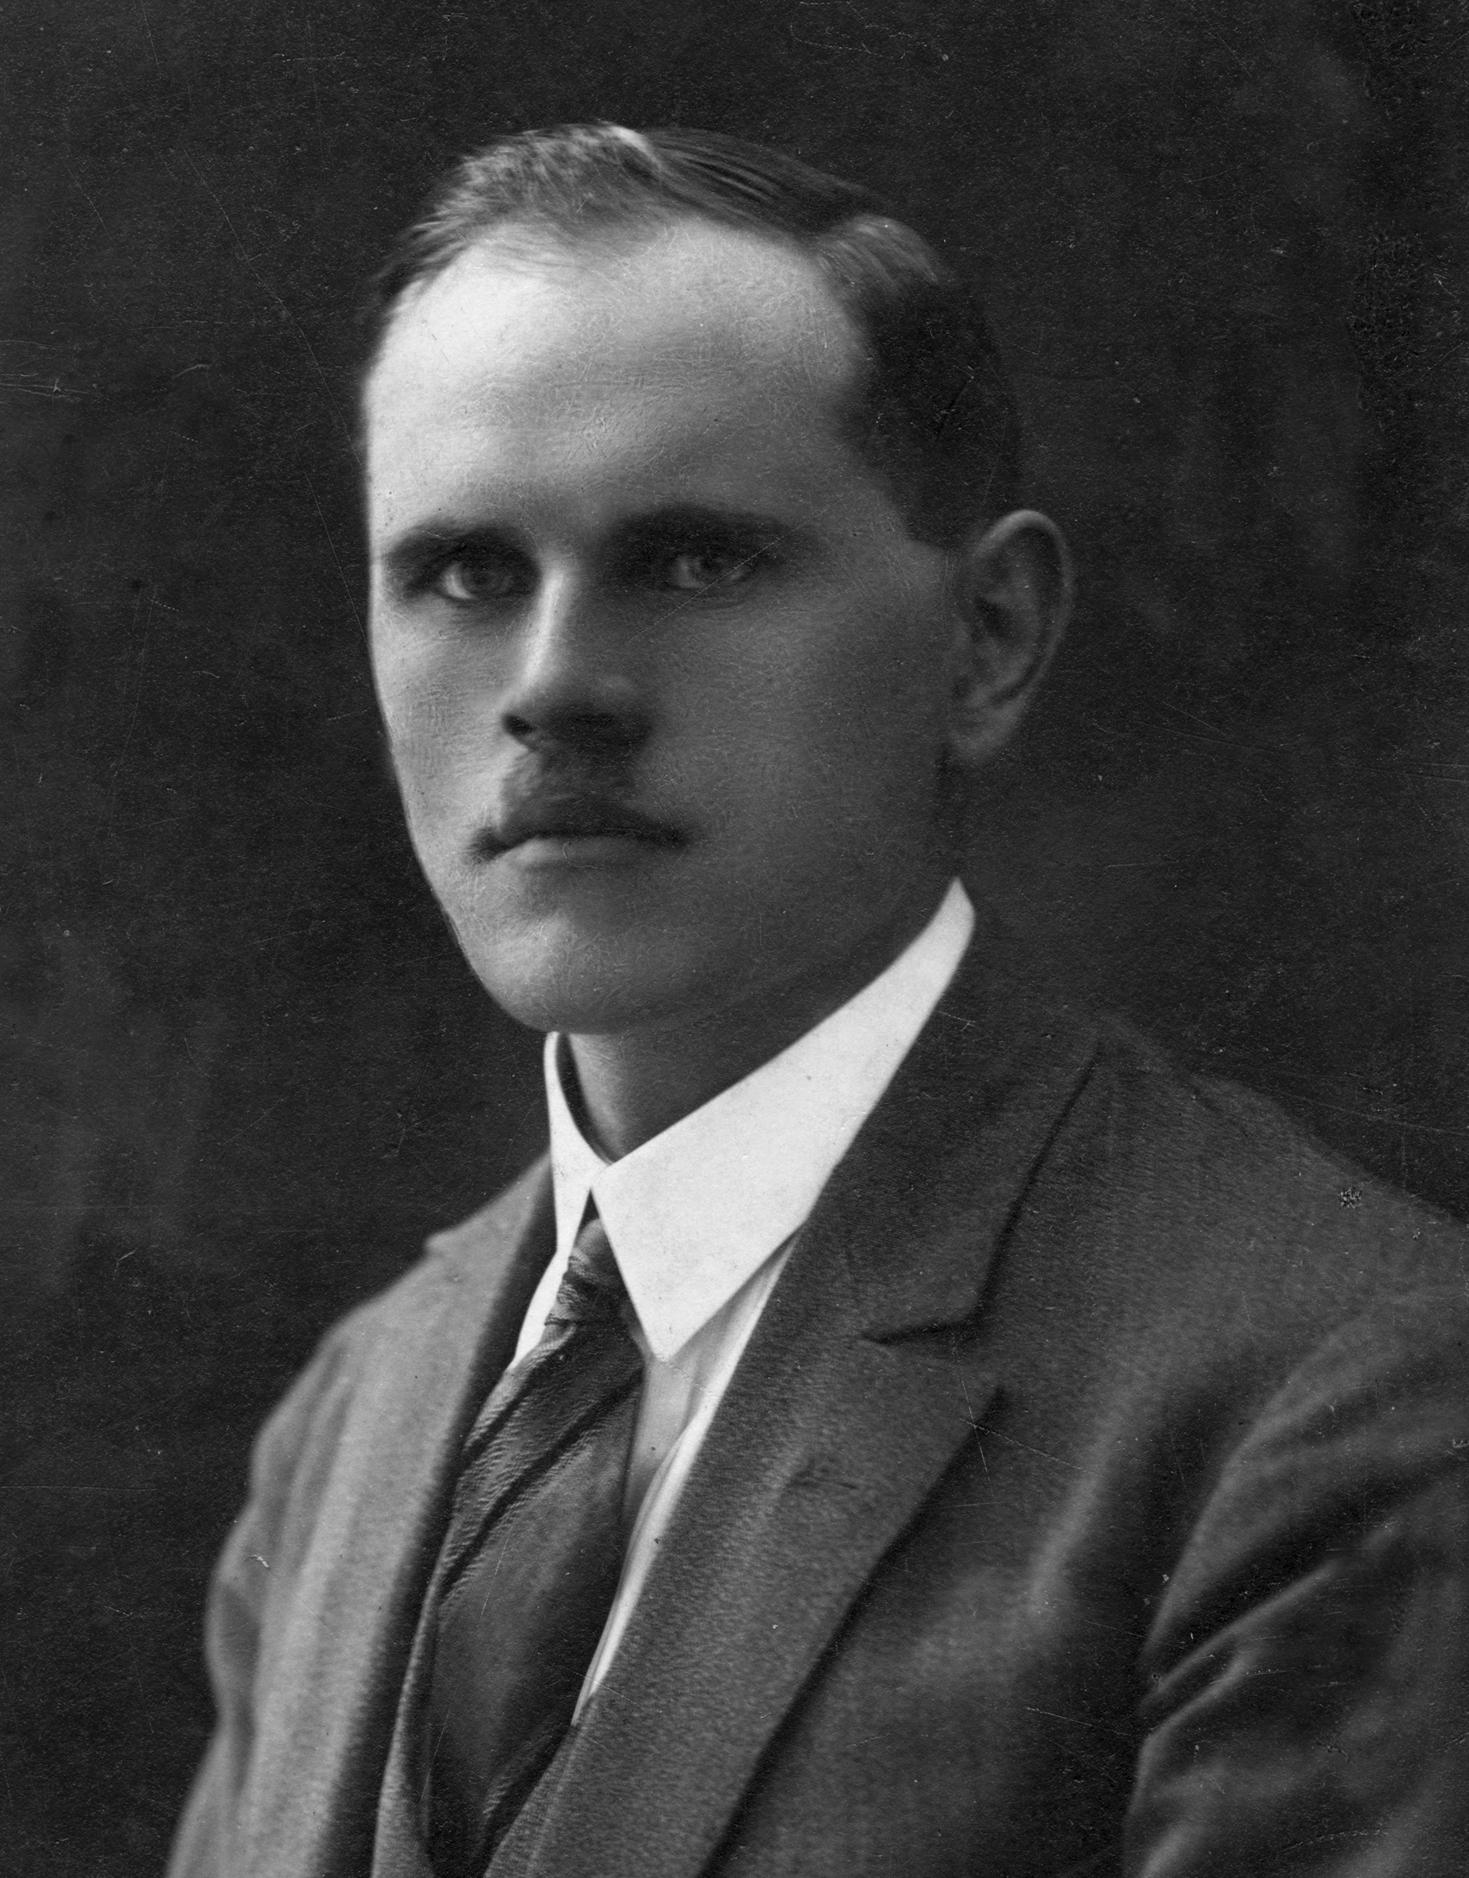 http://wt32a2t.atease.lt/uploads/userfiles/zuvanciuju_gelbejimo_kryziaus/1928-05-20_Antanas-Blažaitis_Kalvarija.jpg